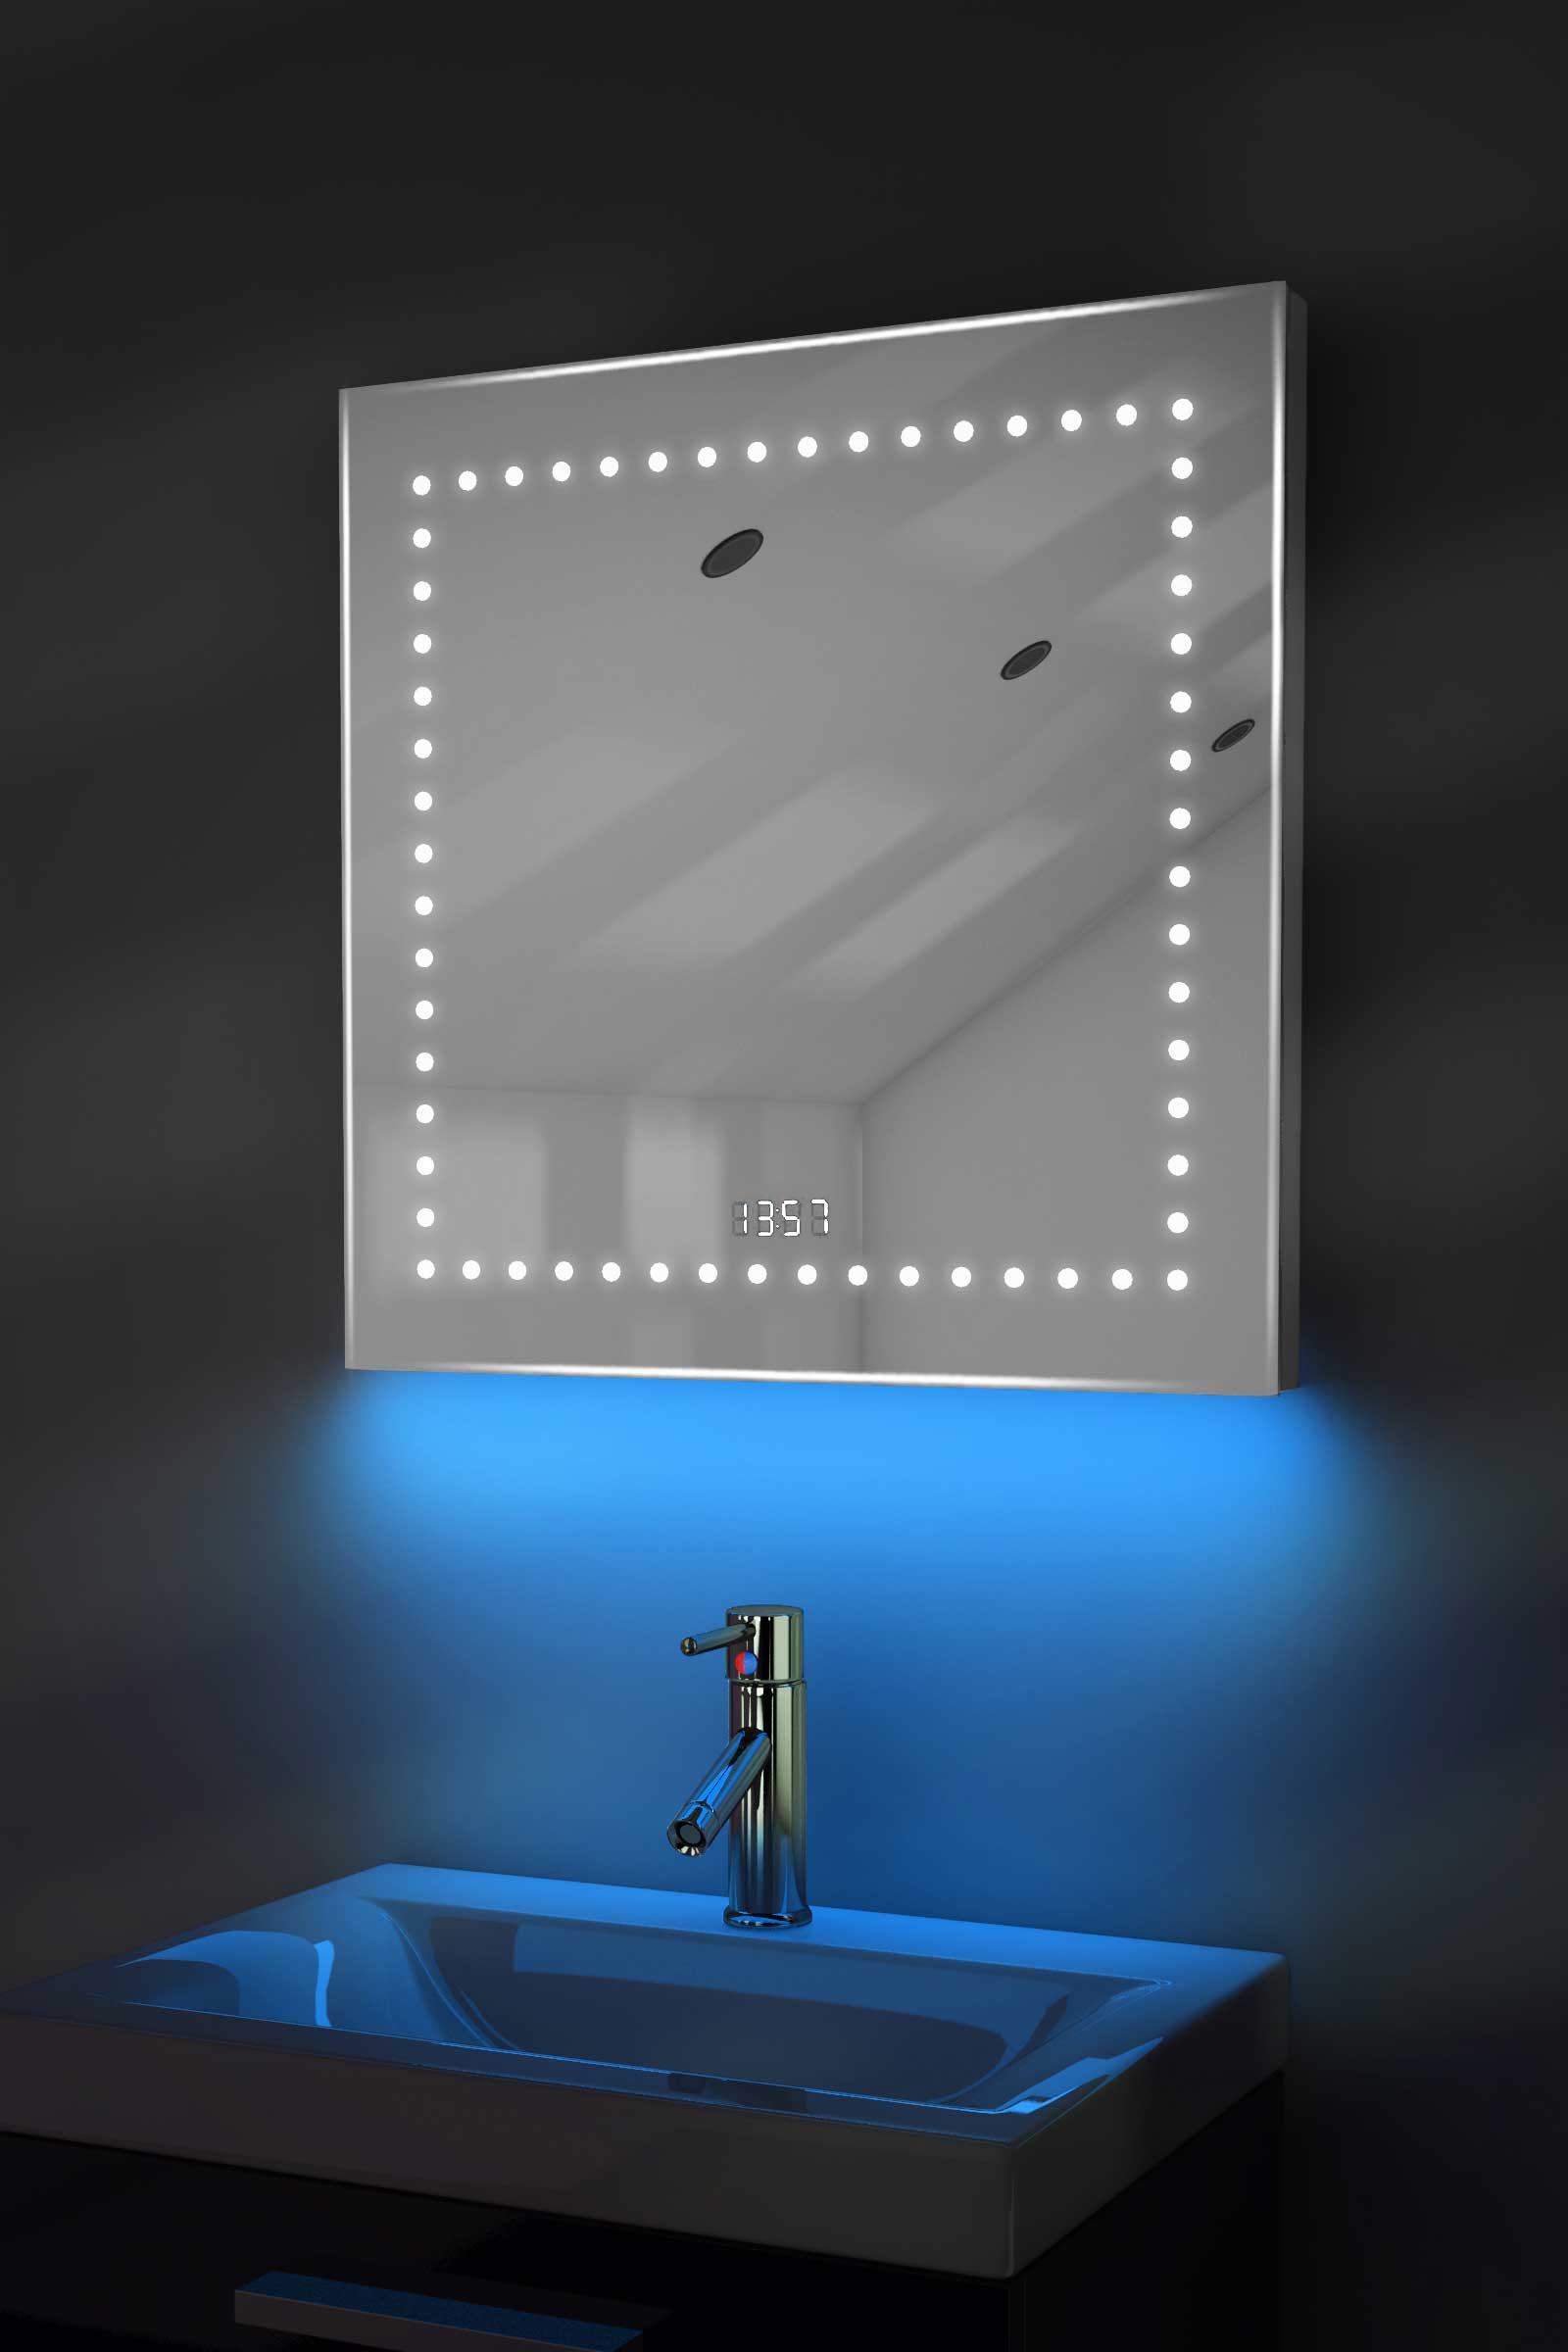 Digital Clock Shaver Bathroom Mirror With Under Lighting Demist Sensor K183b Ebay